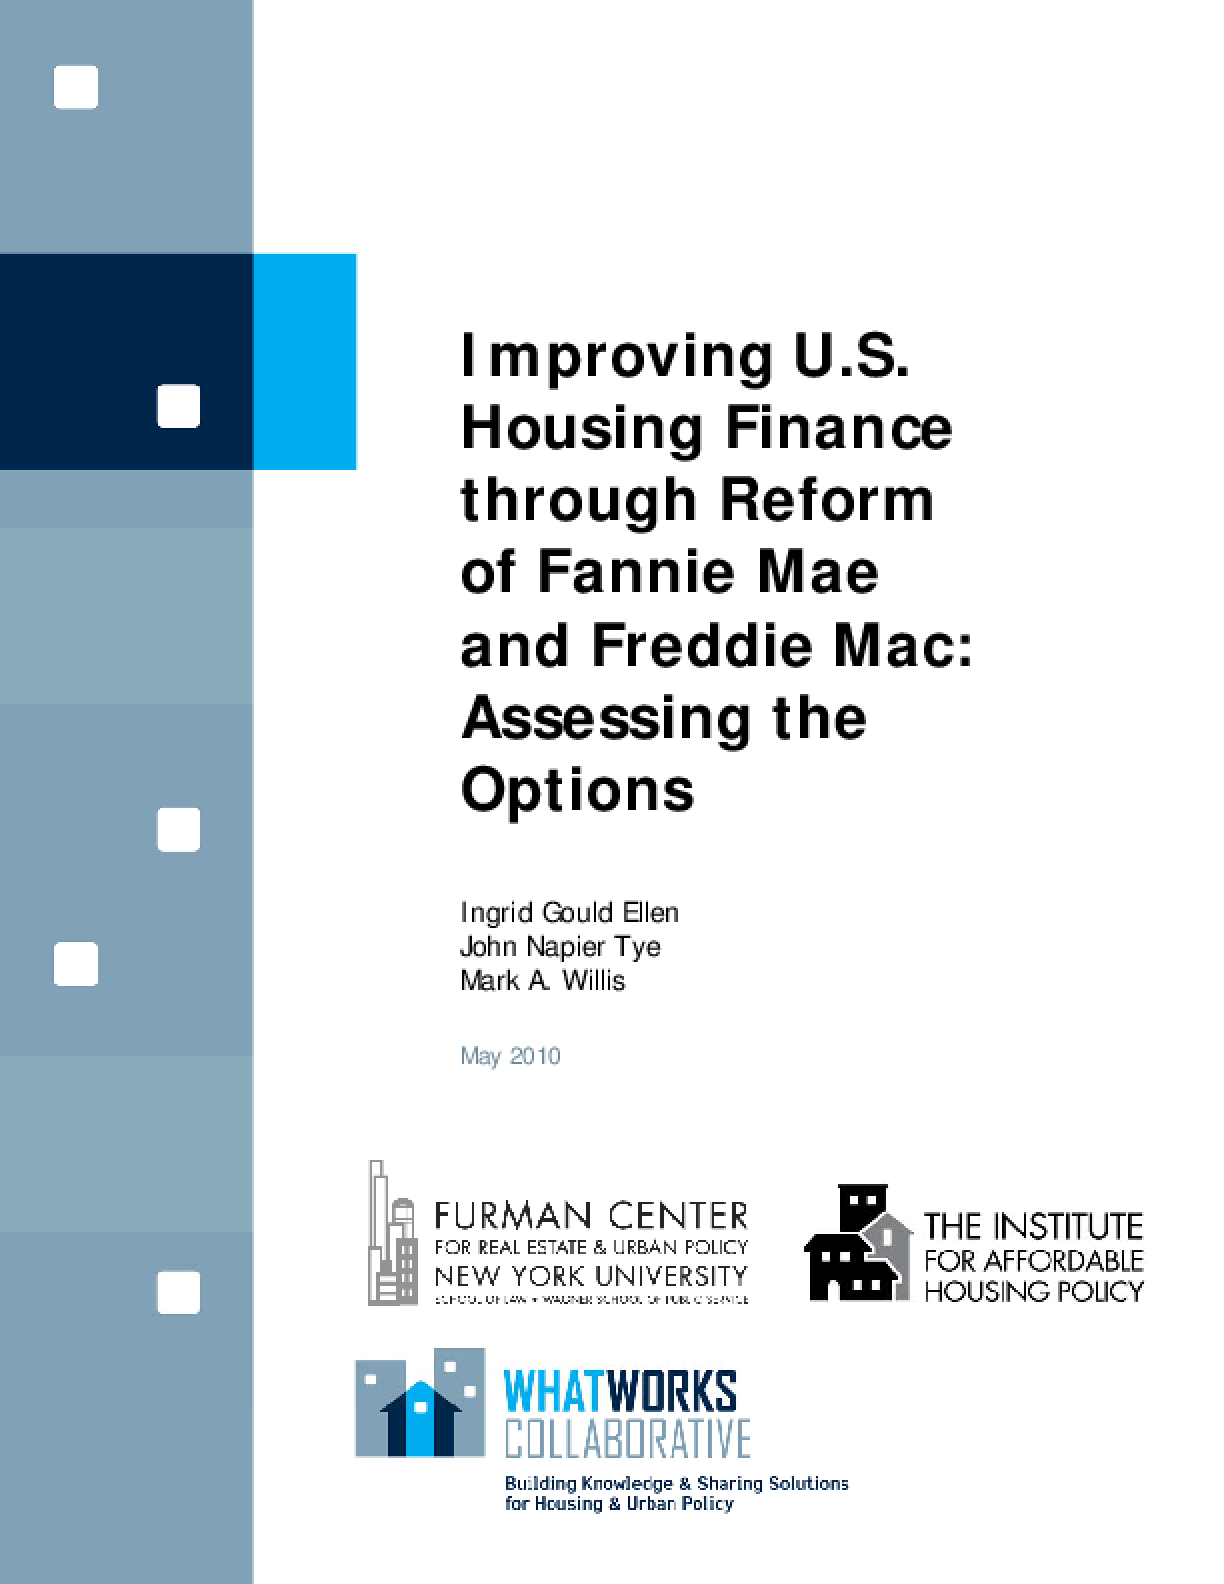 Improving U.S. Housing Finance Through Reform of Fannie Mae and Freddie Mac: Assessing the Options